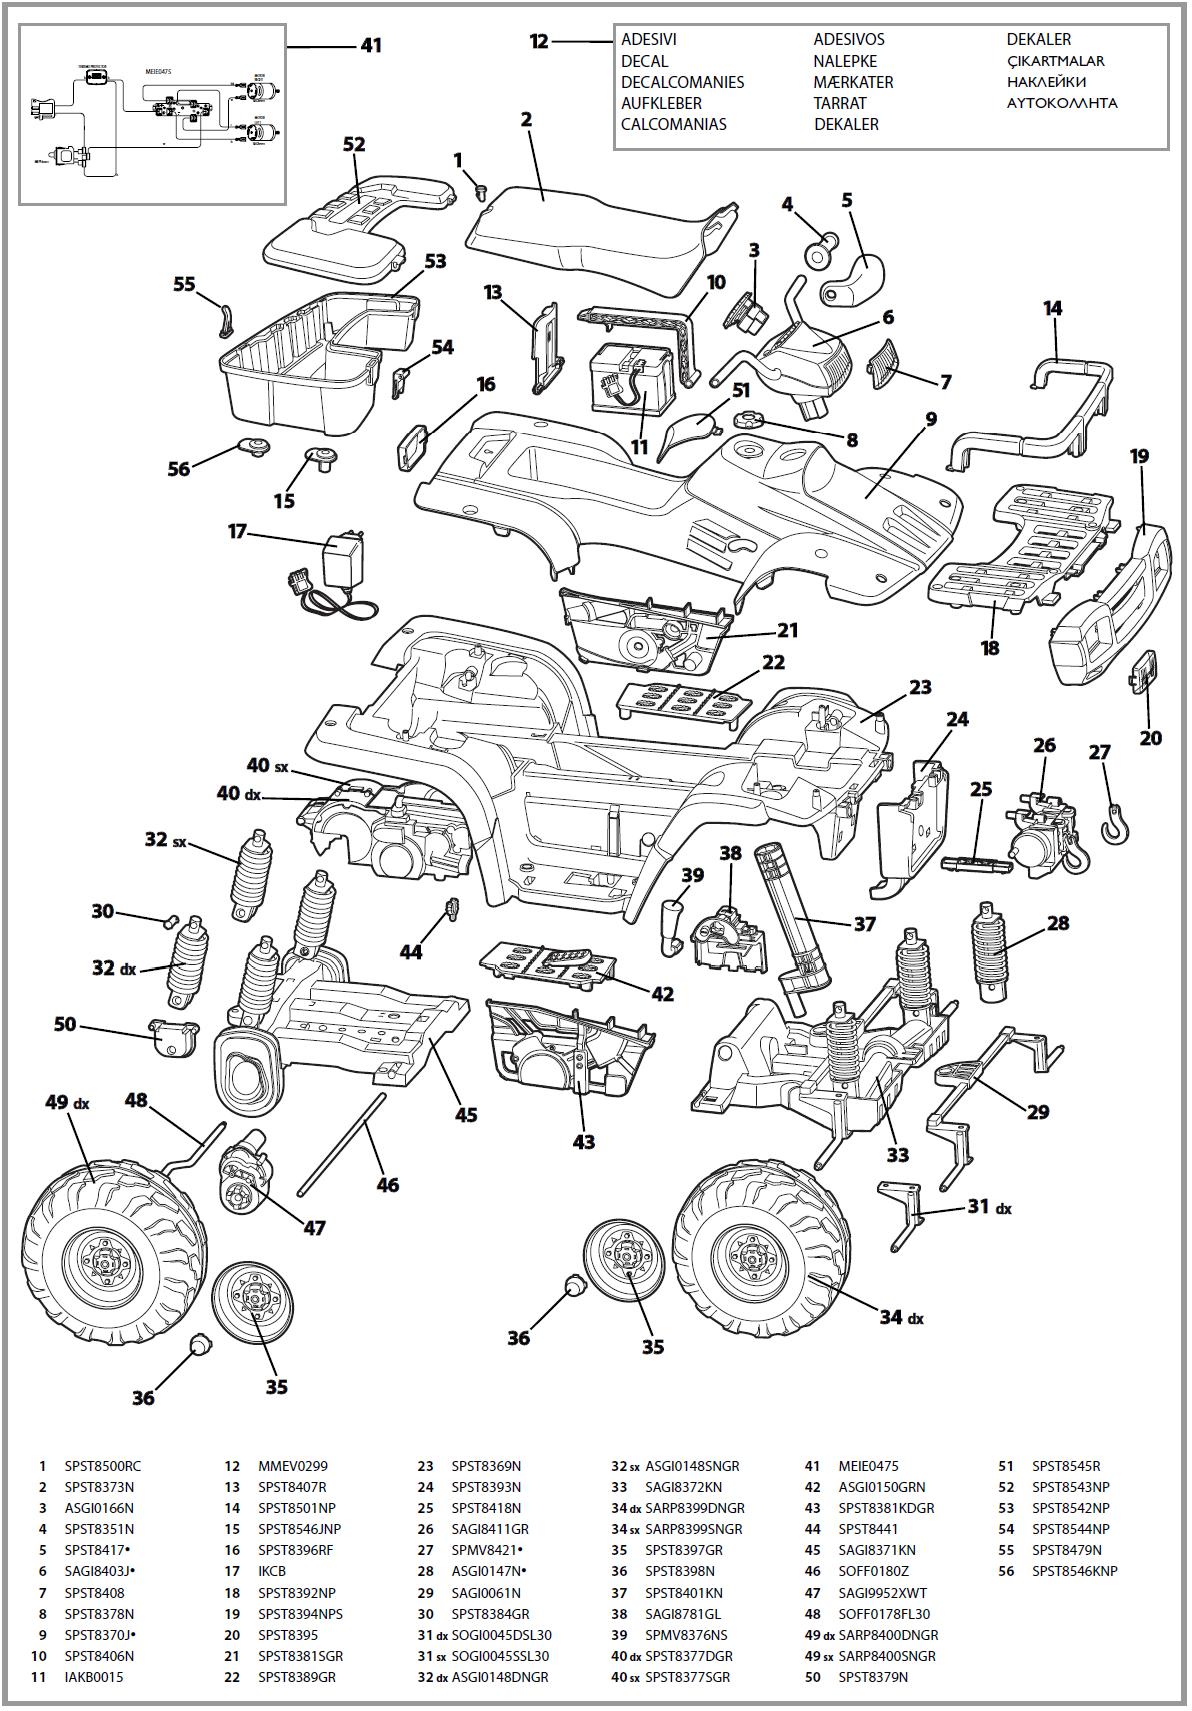 2000 polaris sportsman 500 parts diagram Google Search